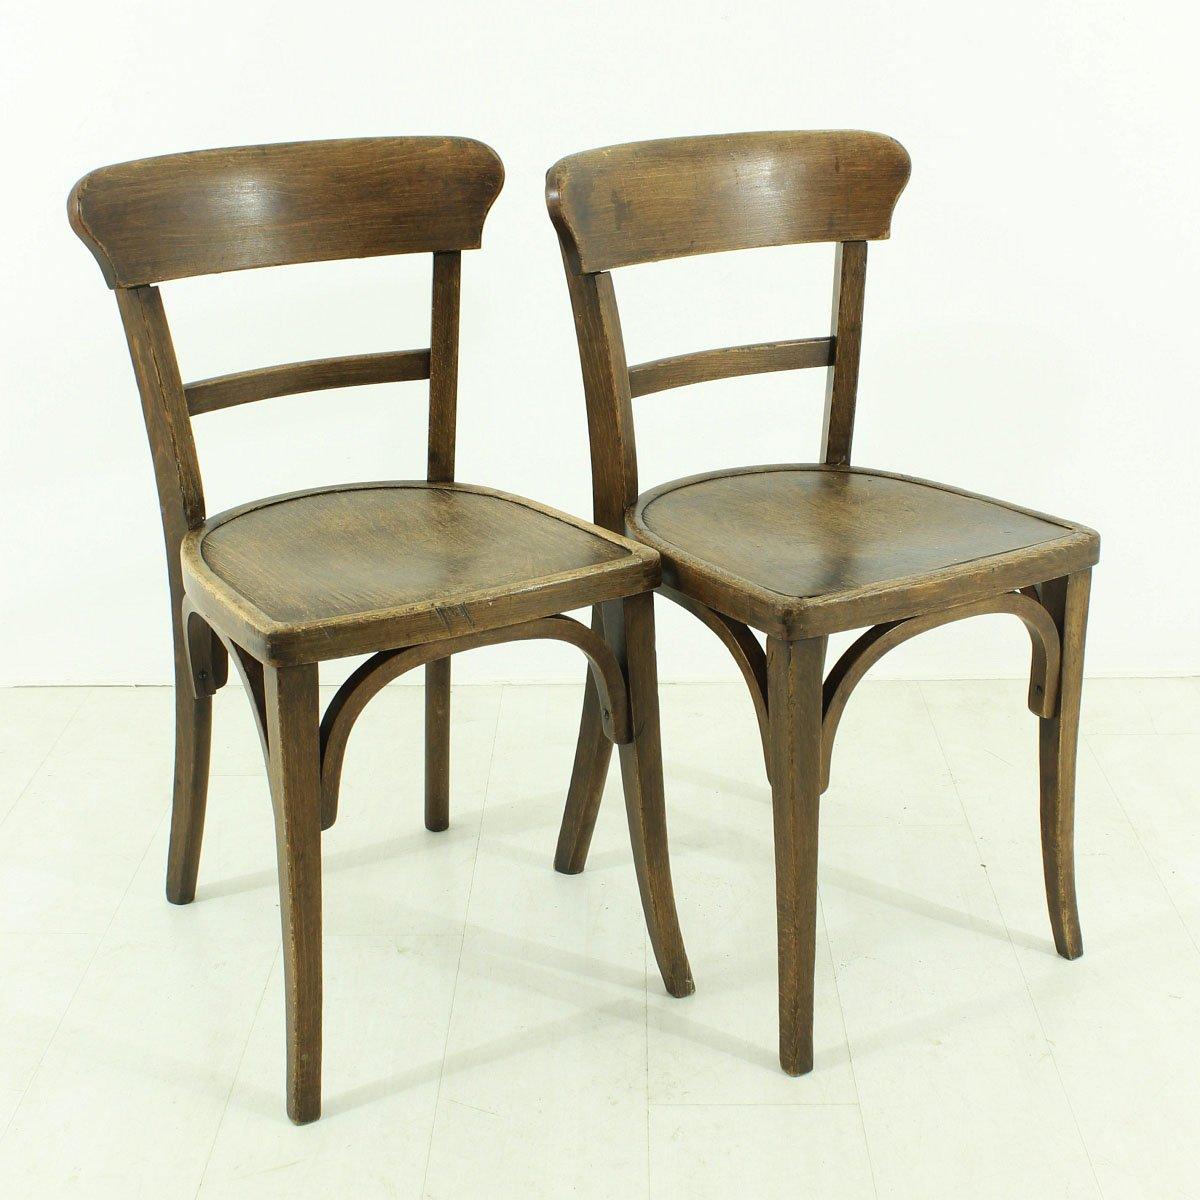 Sedie da pranzo vintage anni 39 30 set di 2 in vendita su for Sedie da pranzo